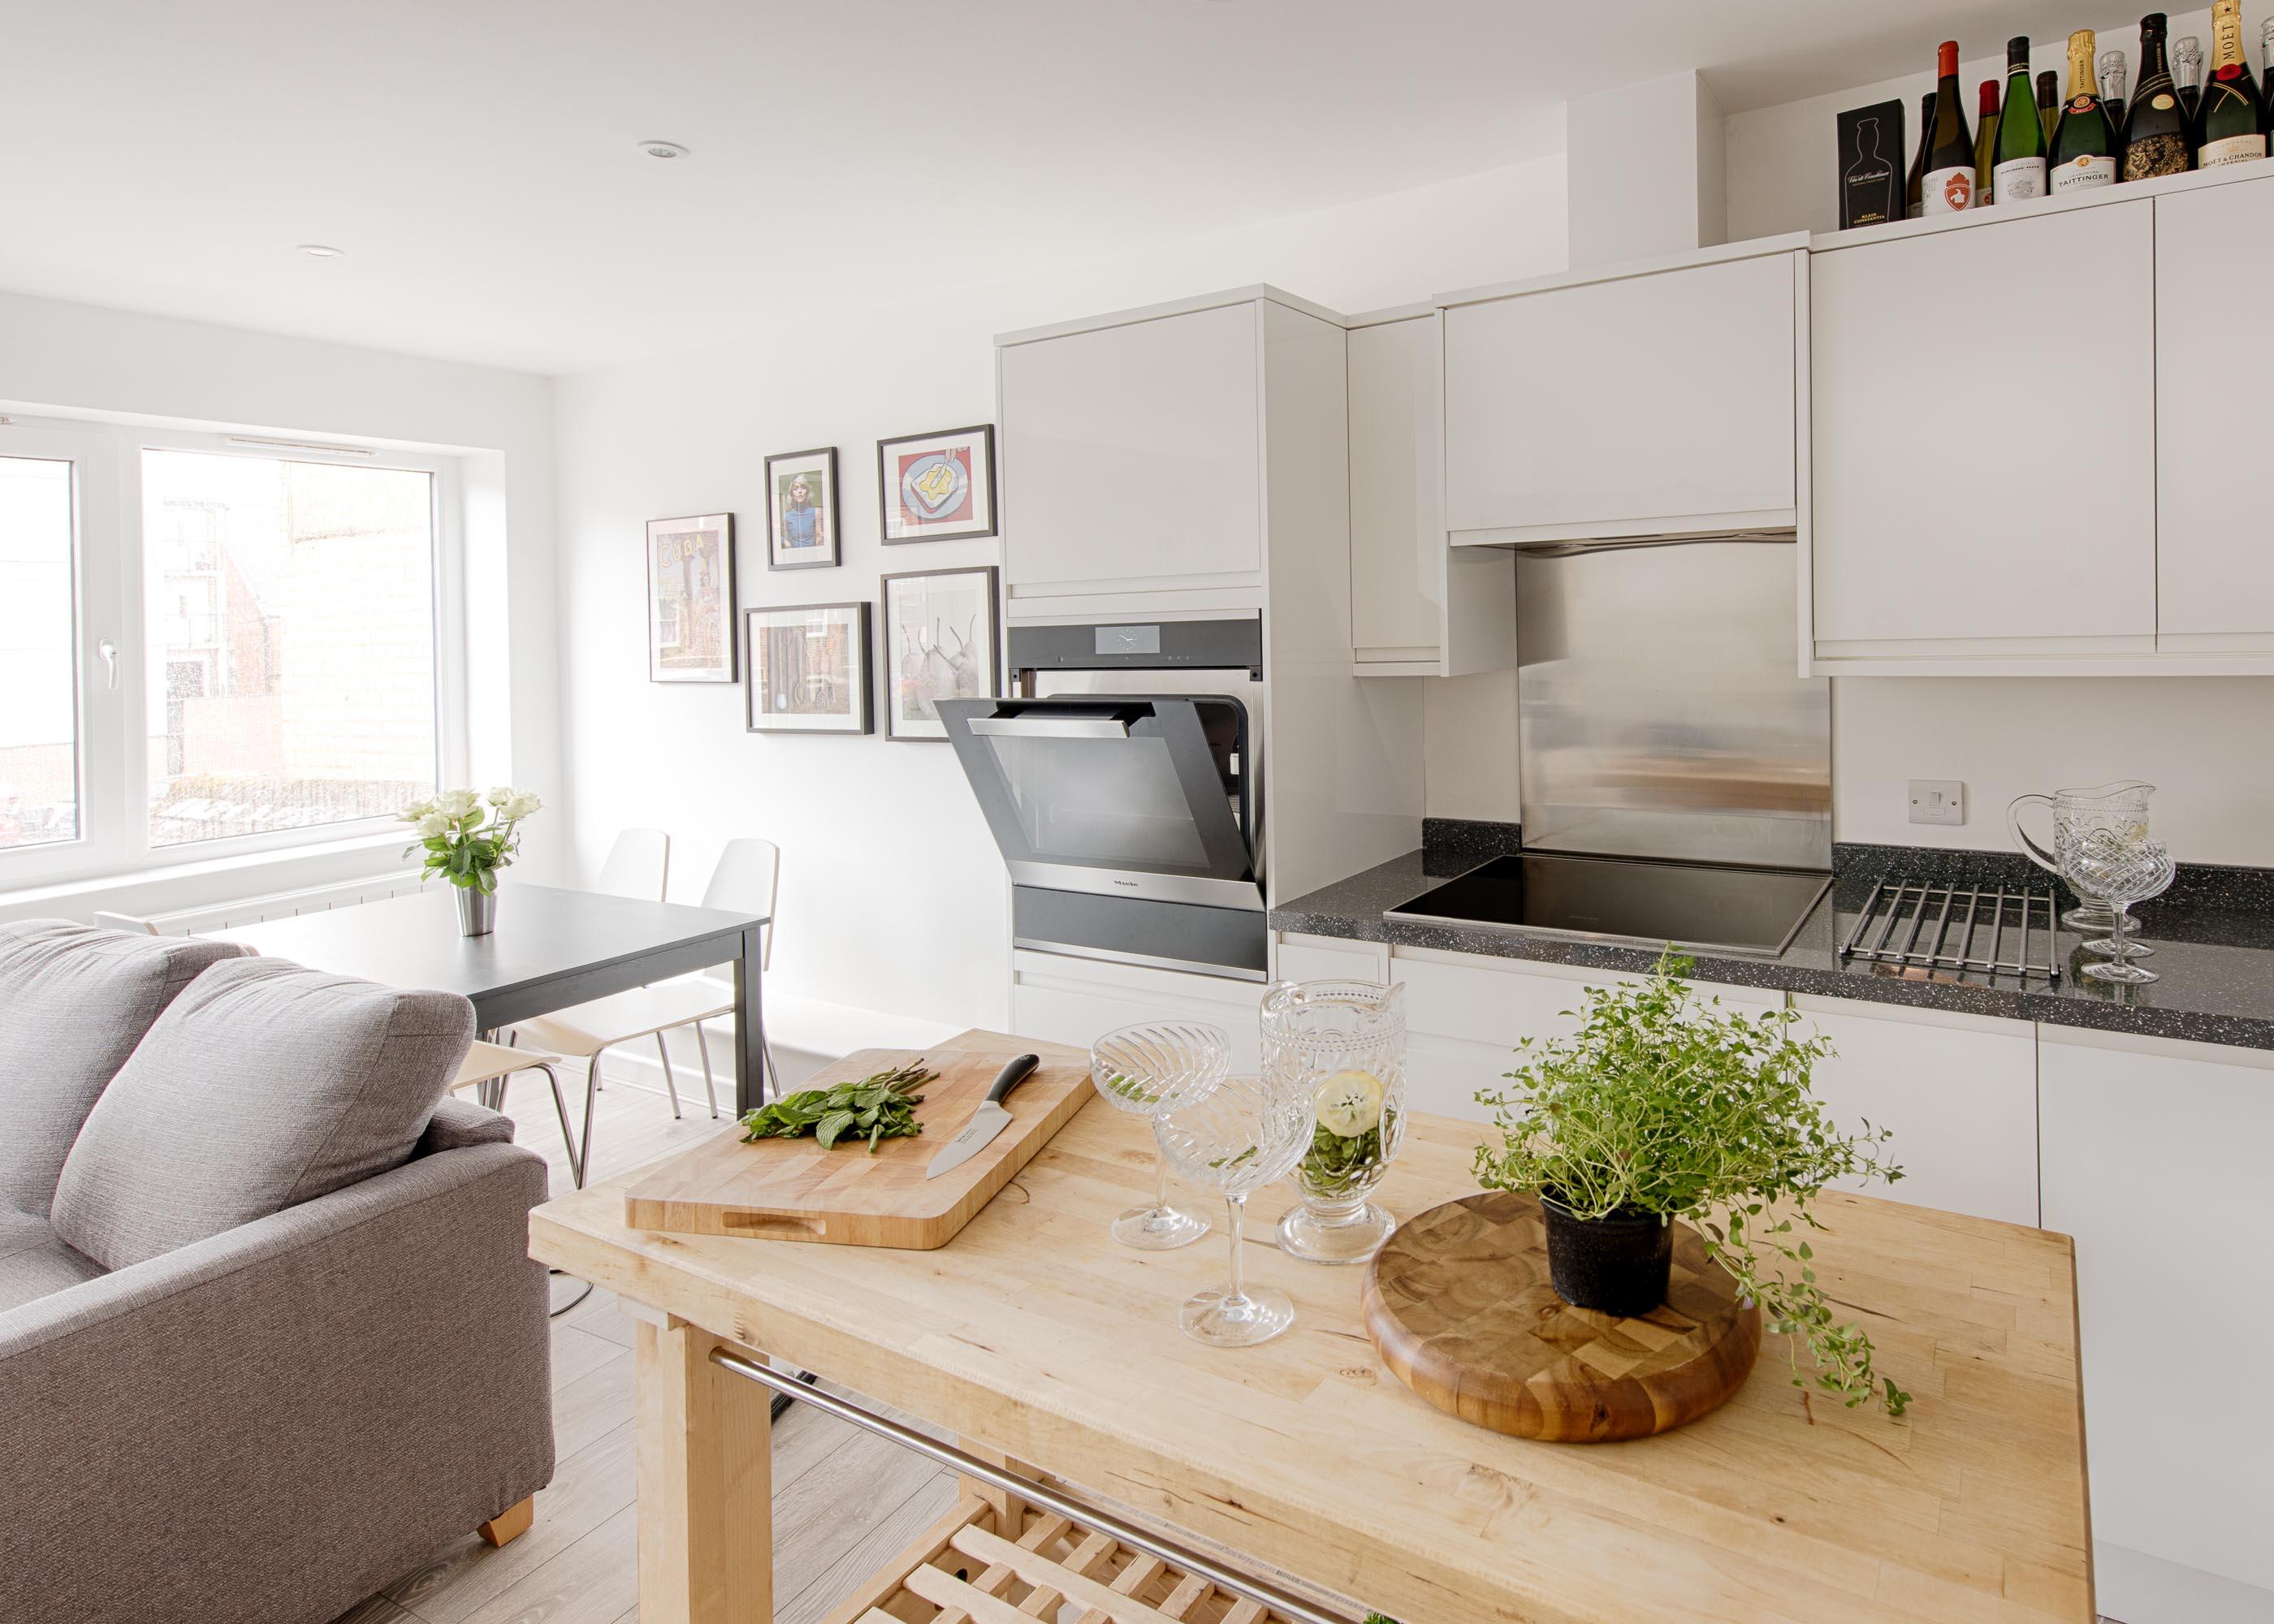 Top Tips For Designing A Kitchen Diner - Der Kern by Miele